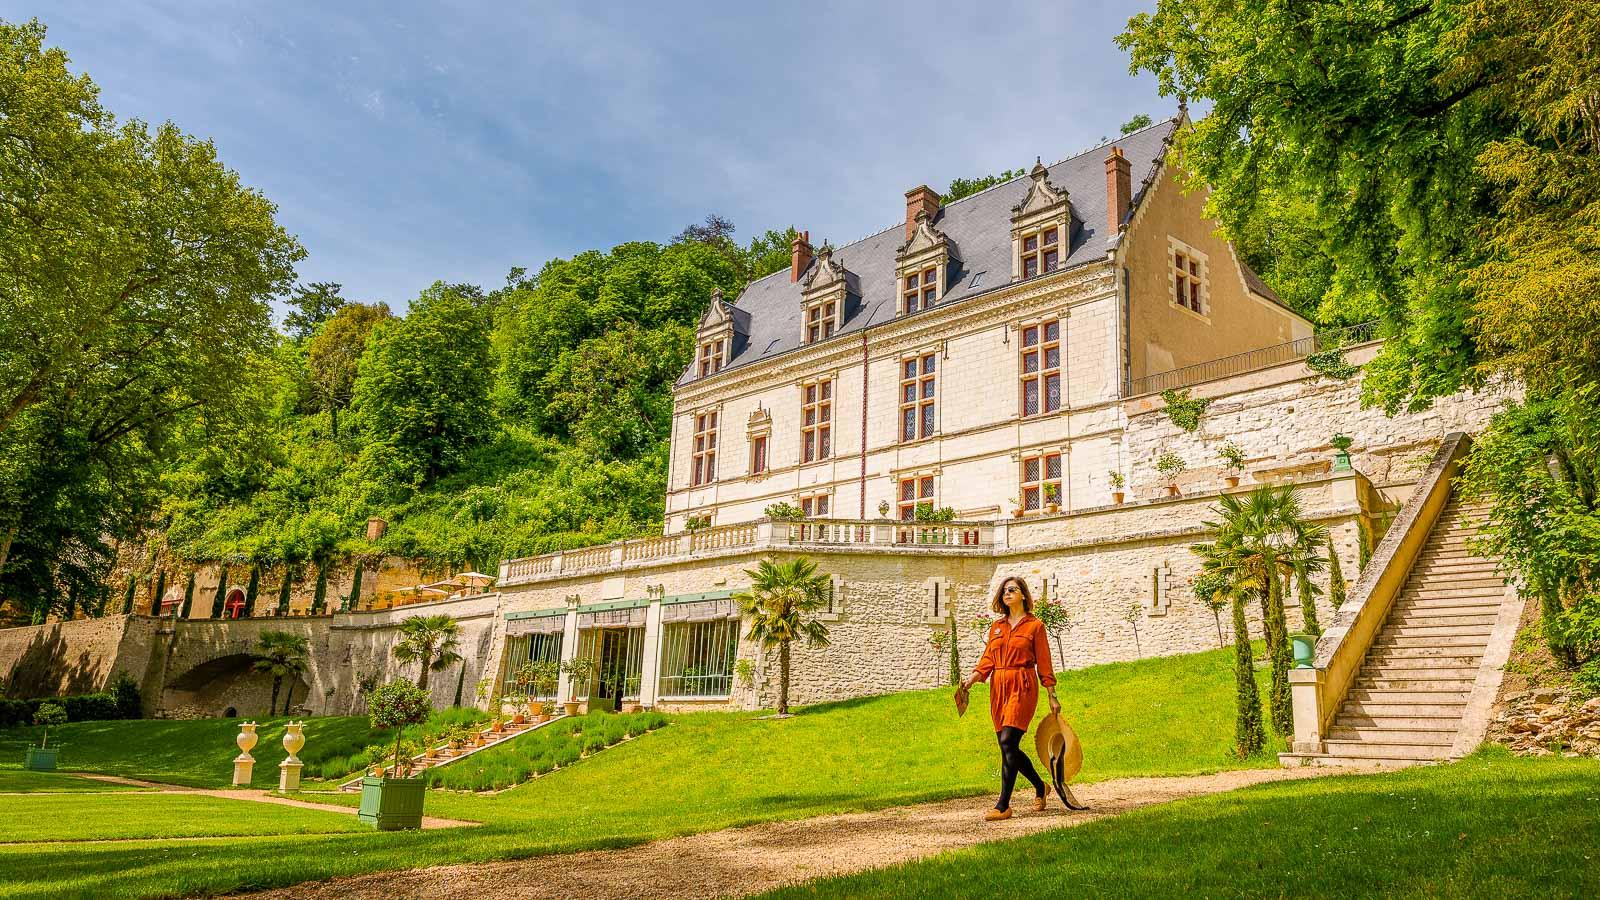 The Renaissance architecture of Château Gaillard